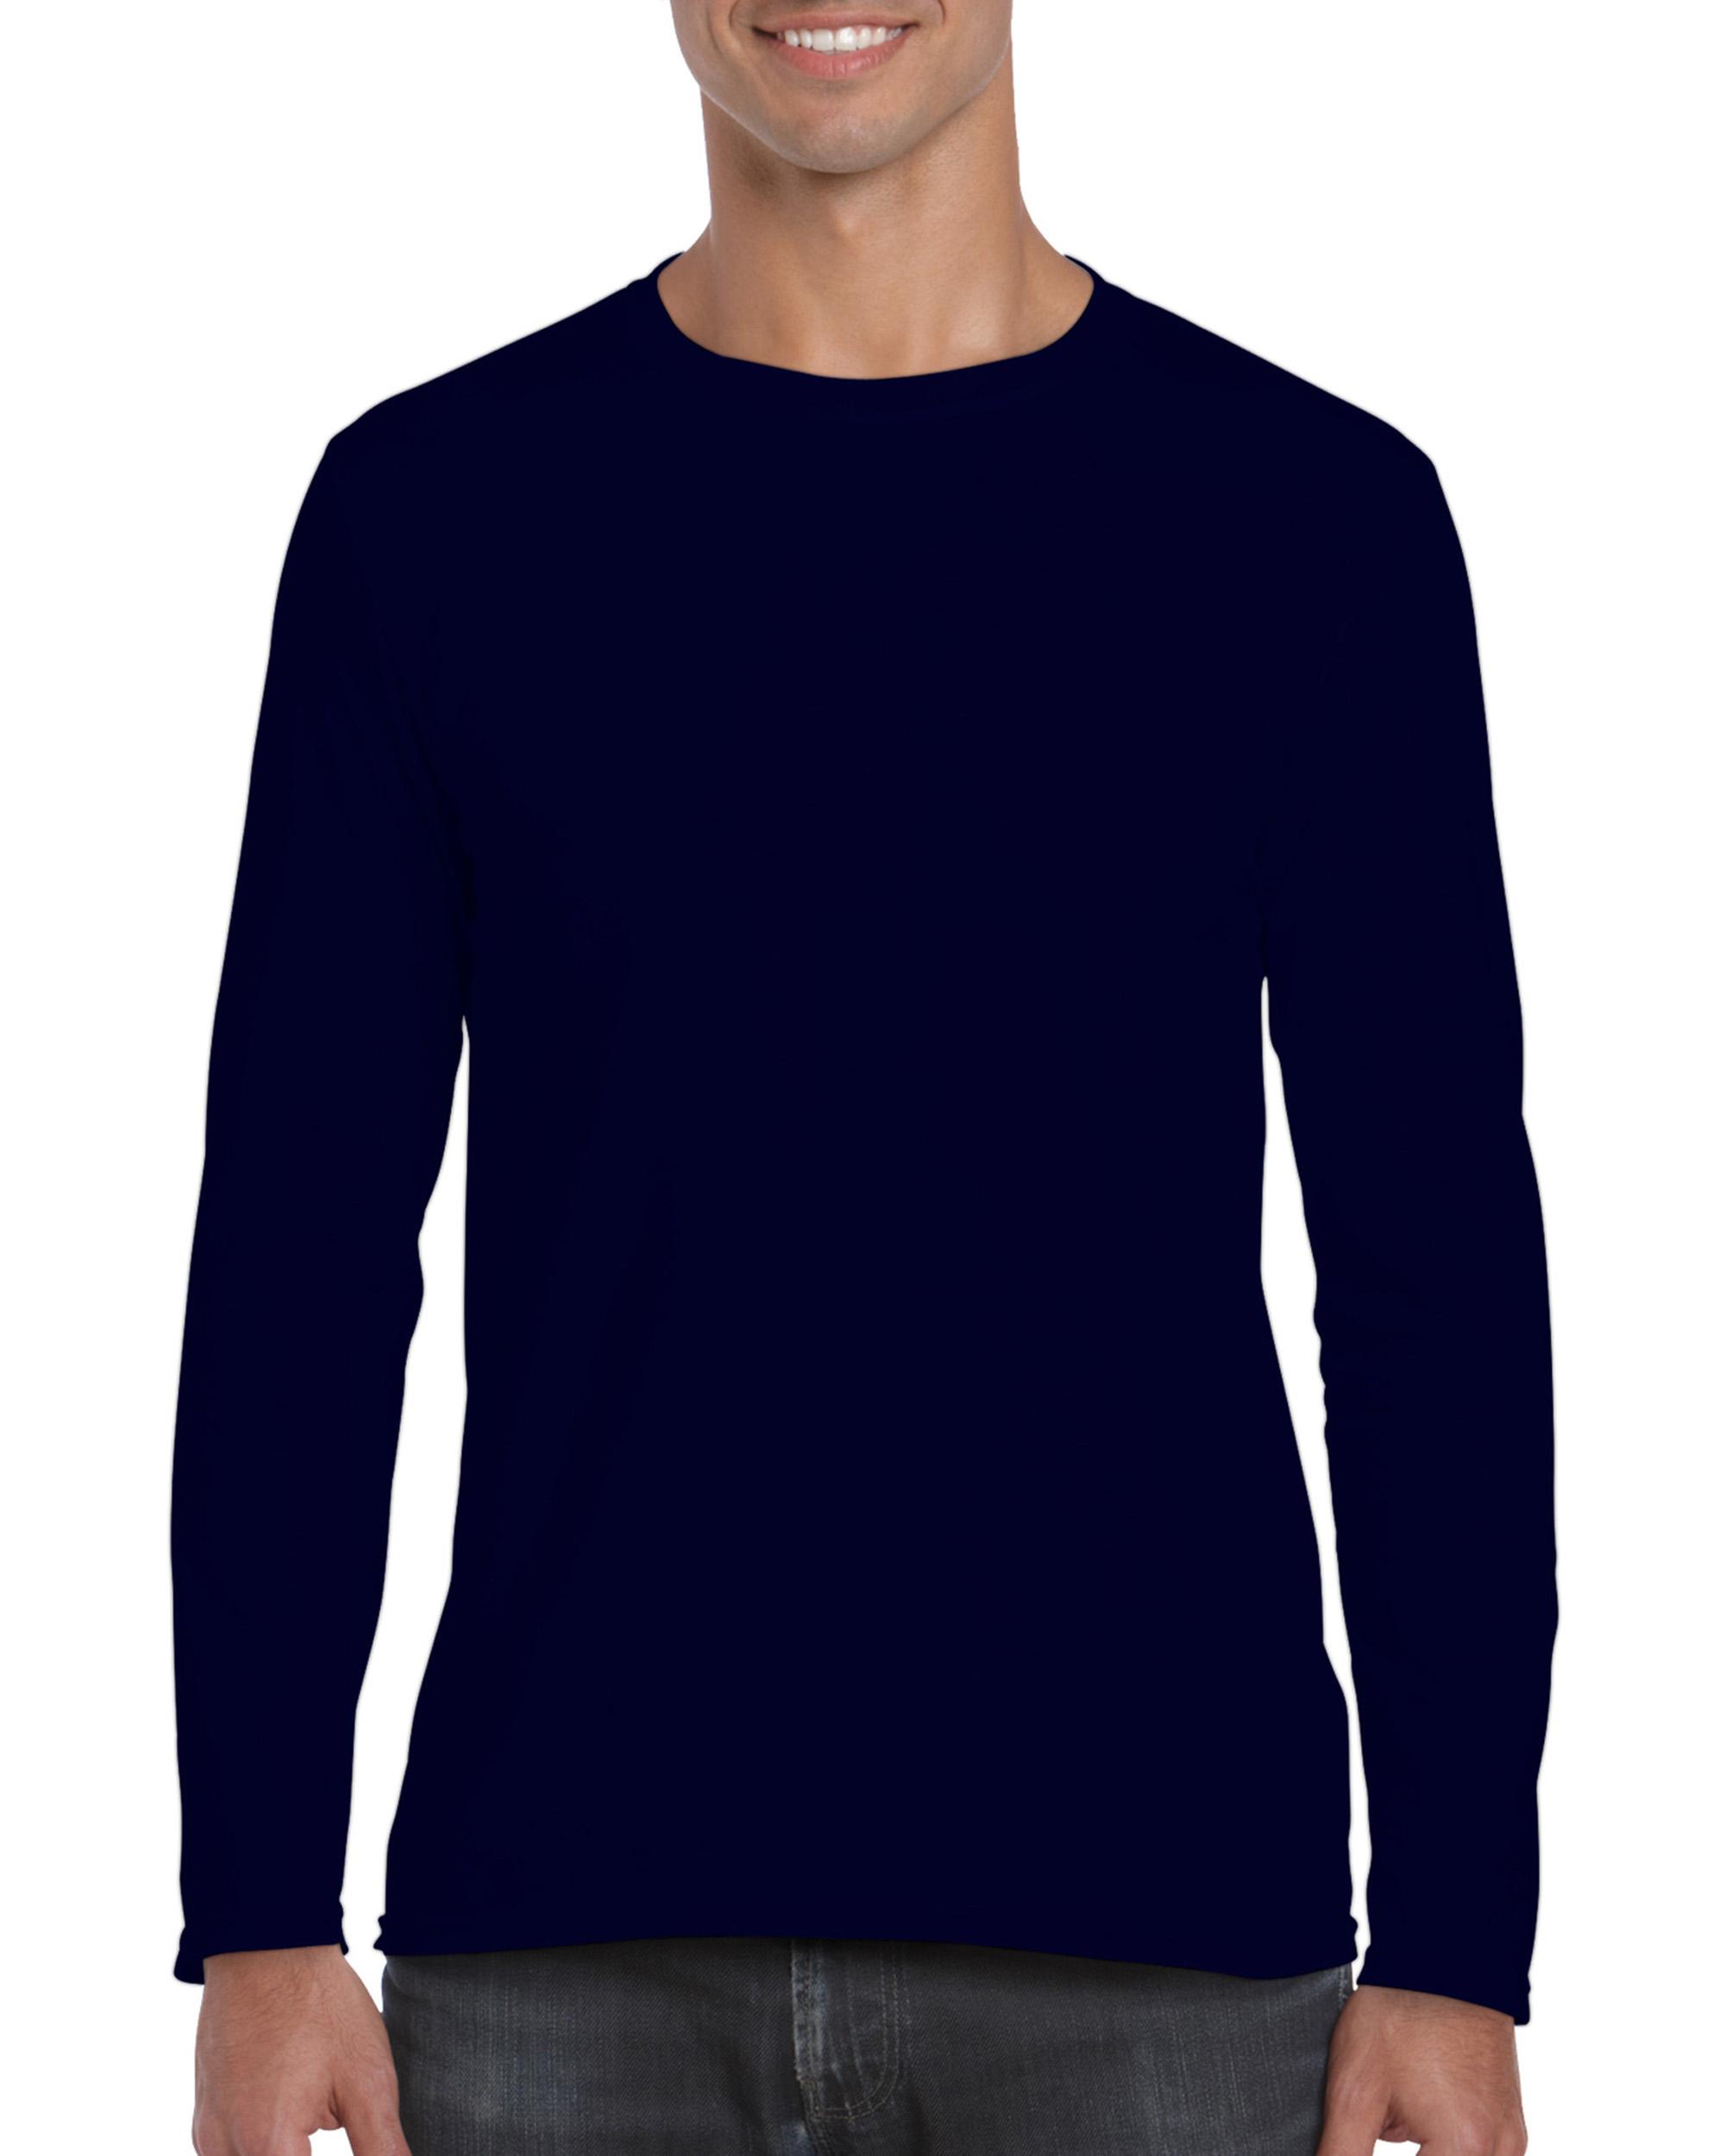 72591b7d5912f Gildan 64400 - Softstyle Long Sleeve T-Shirt